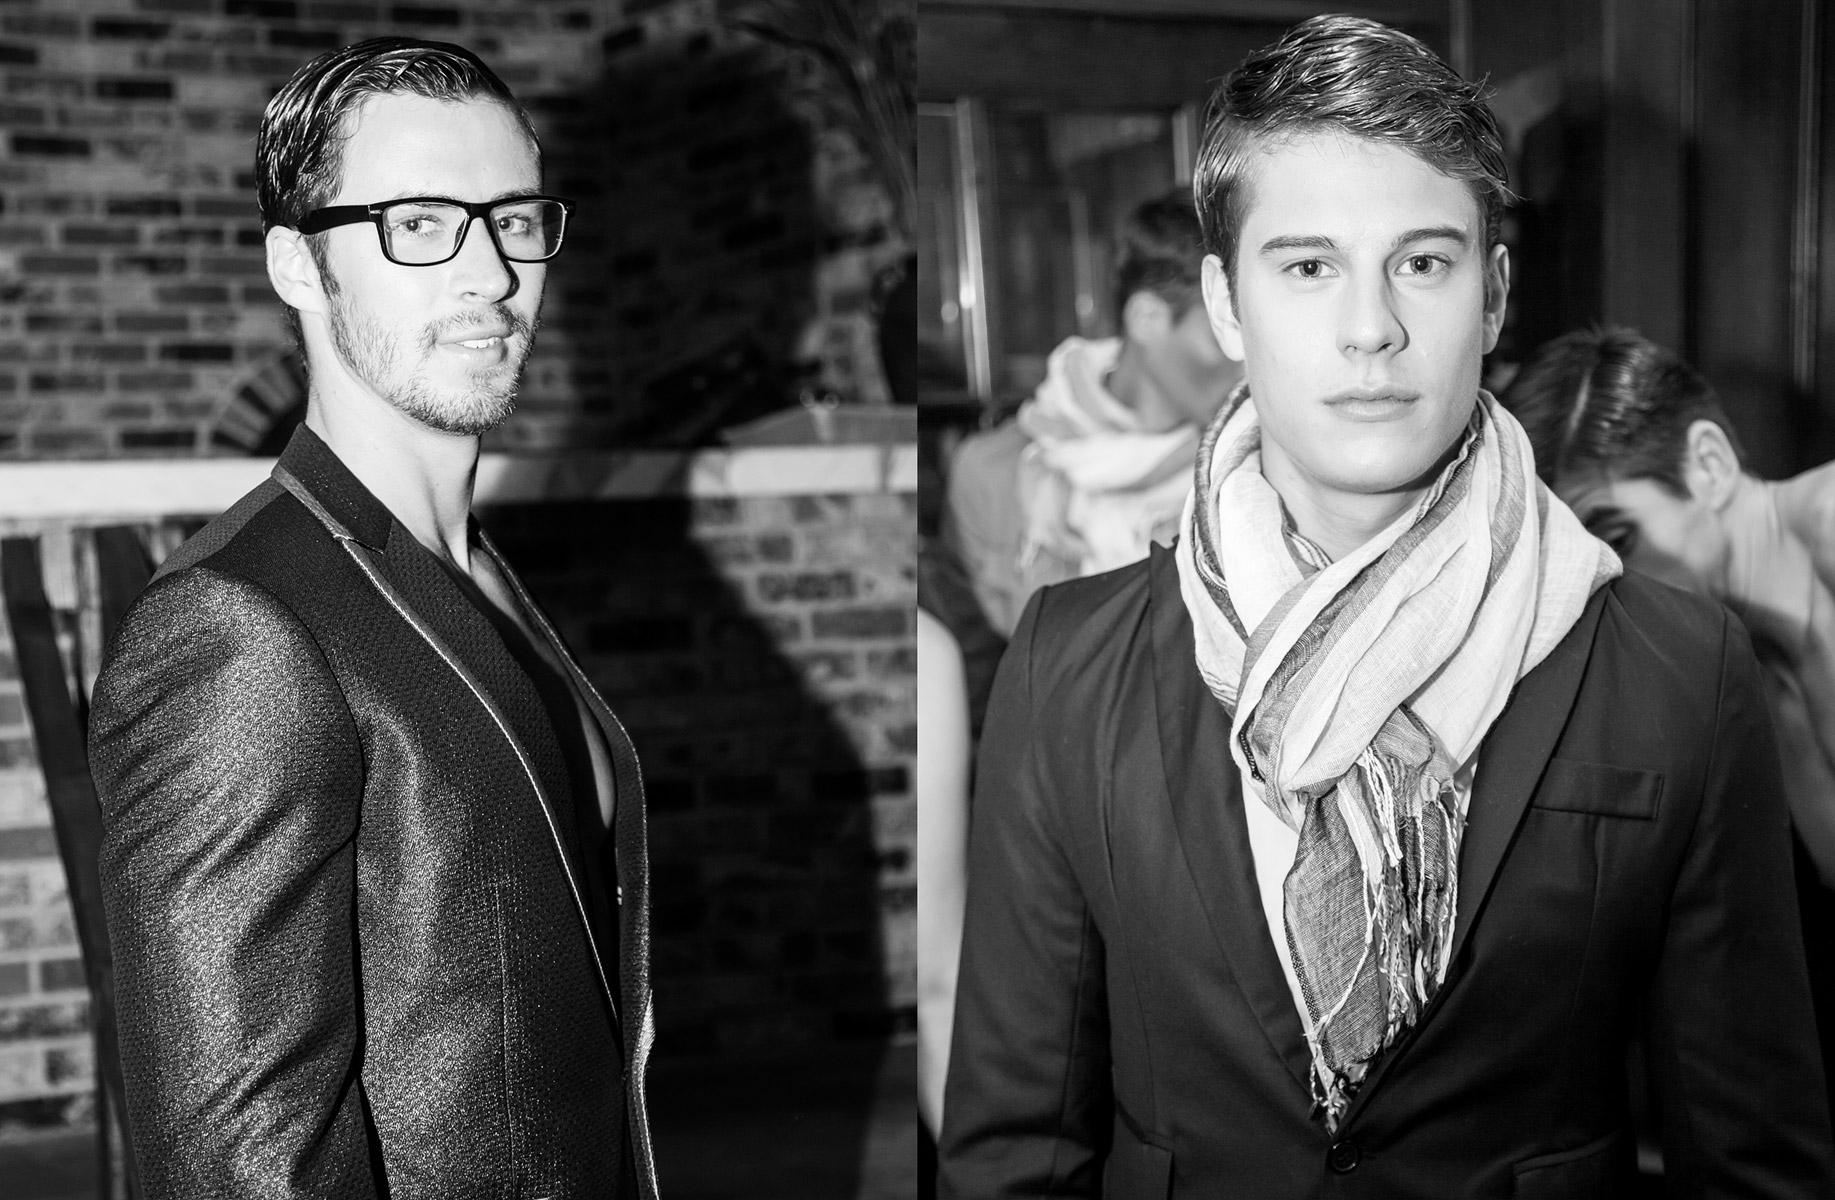 new-mexico-albuquerque-male-models-men-15.jpg